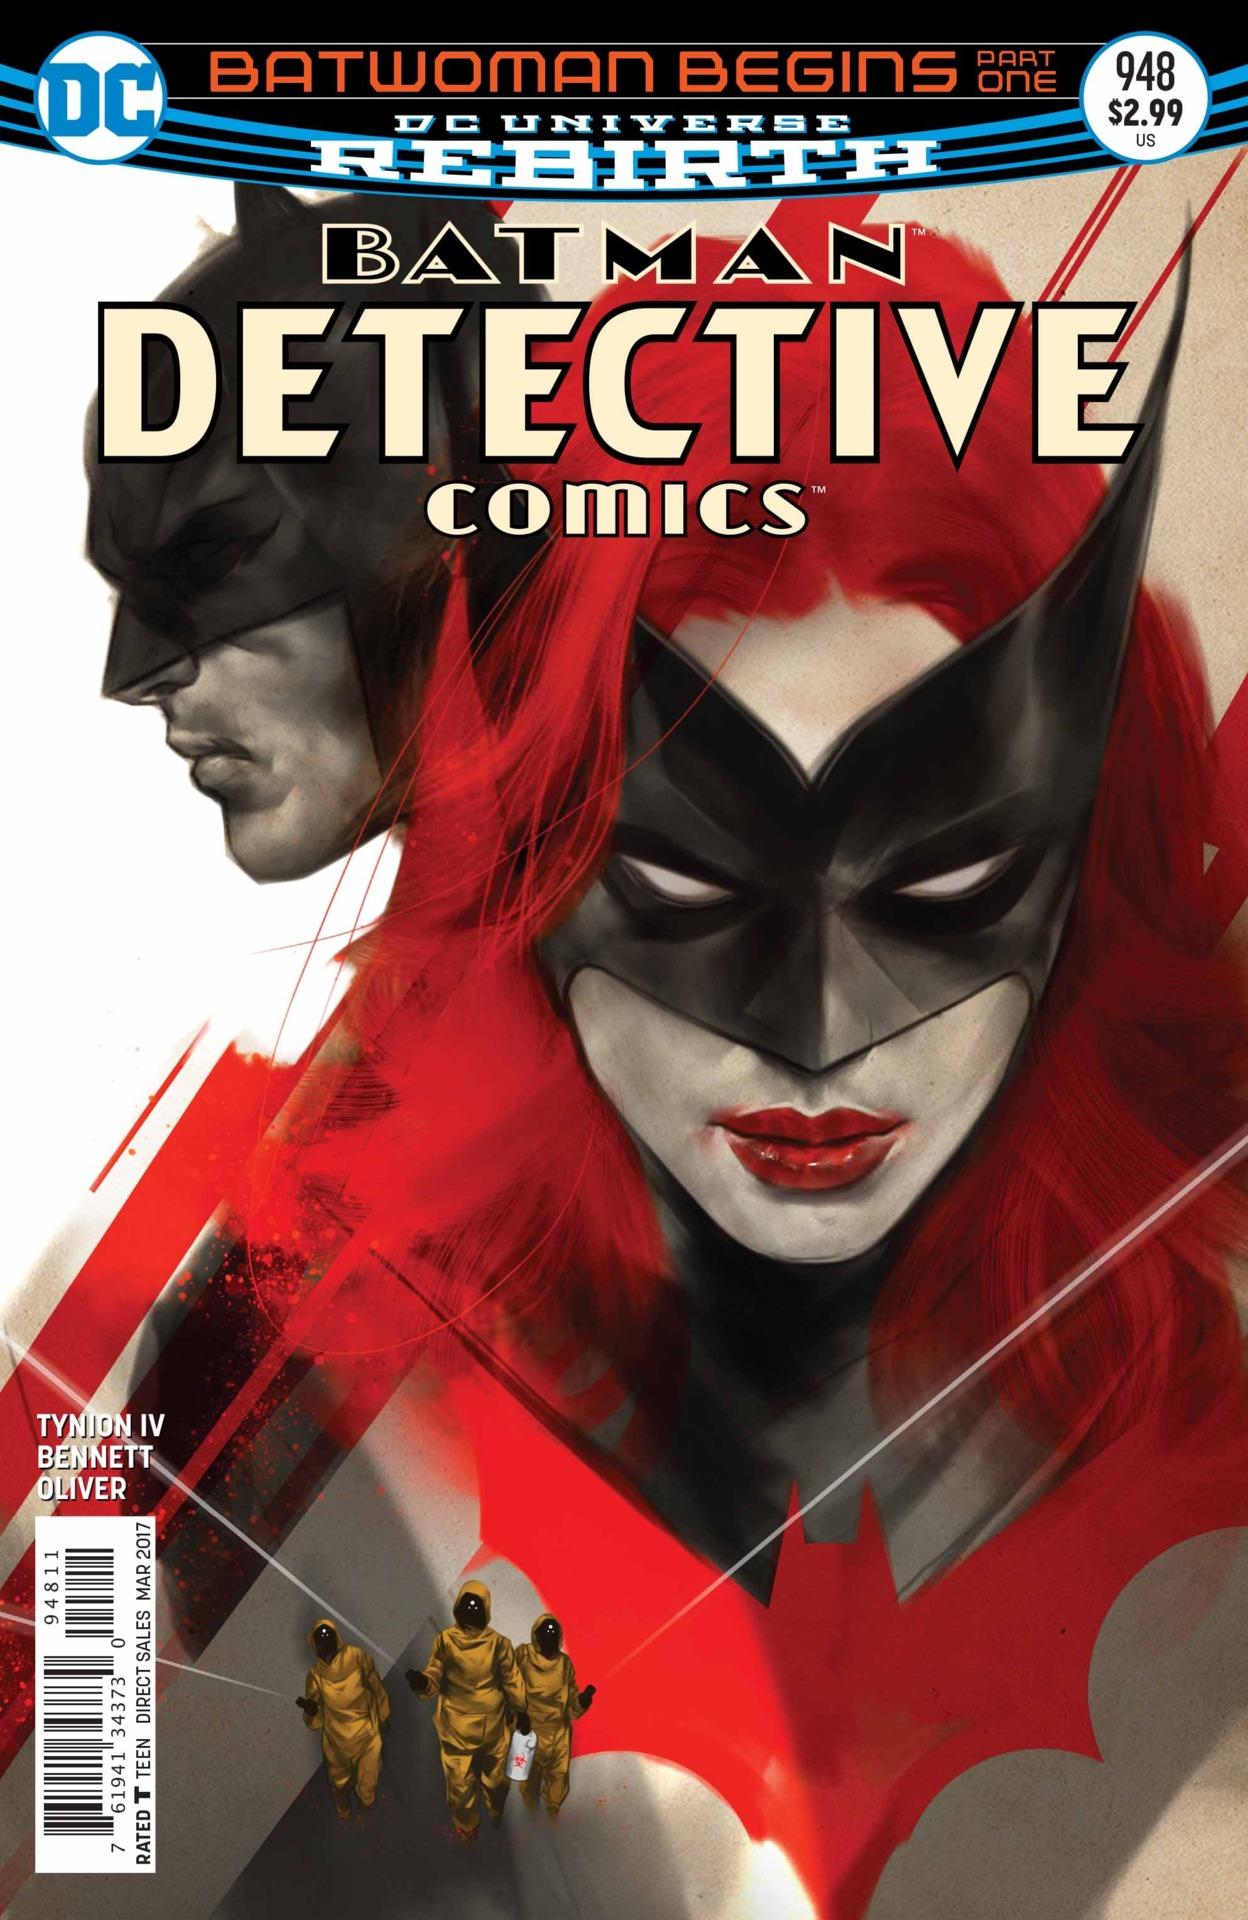 Detective Comics #948 by Ben Oliver